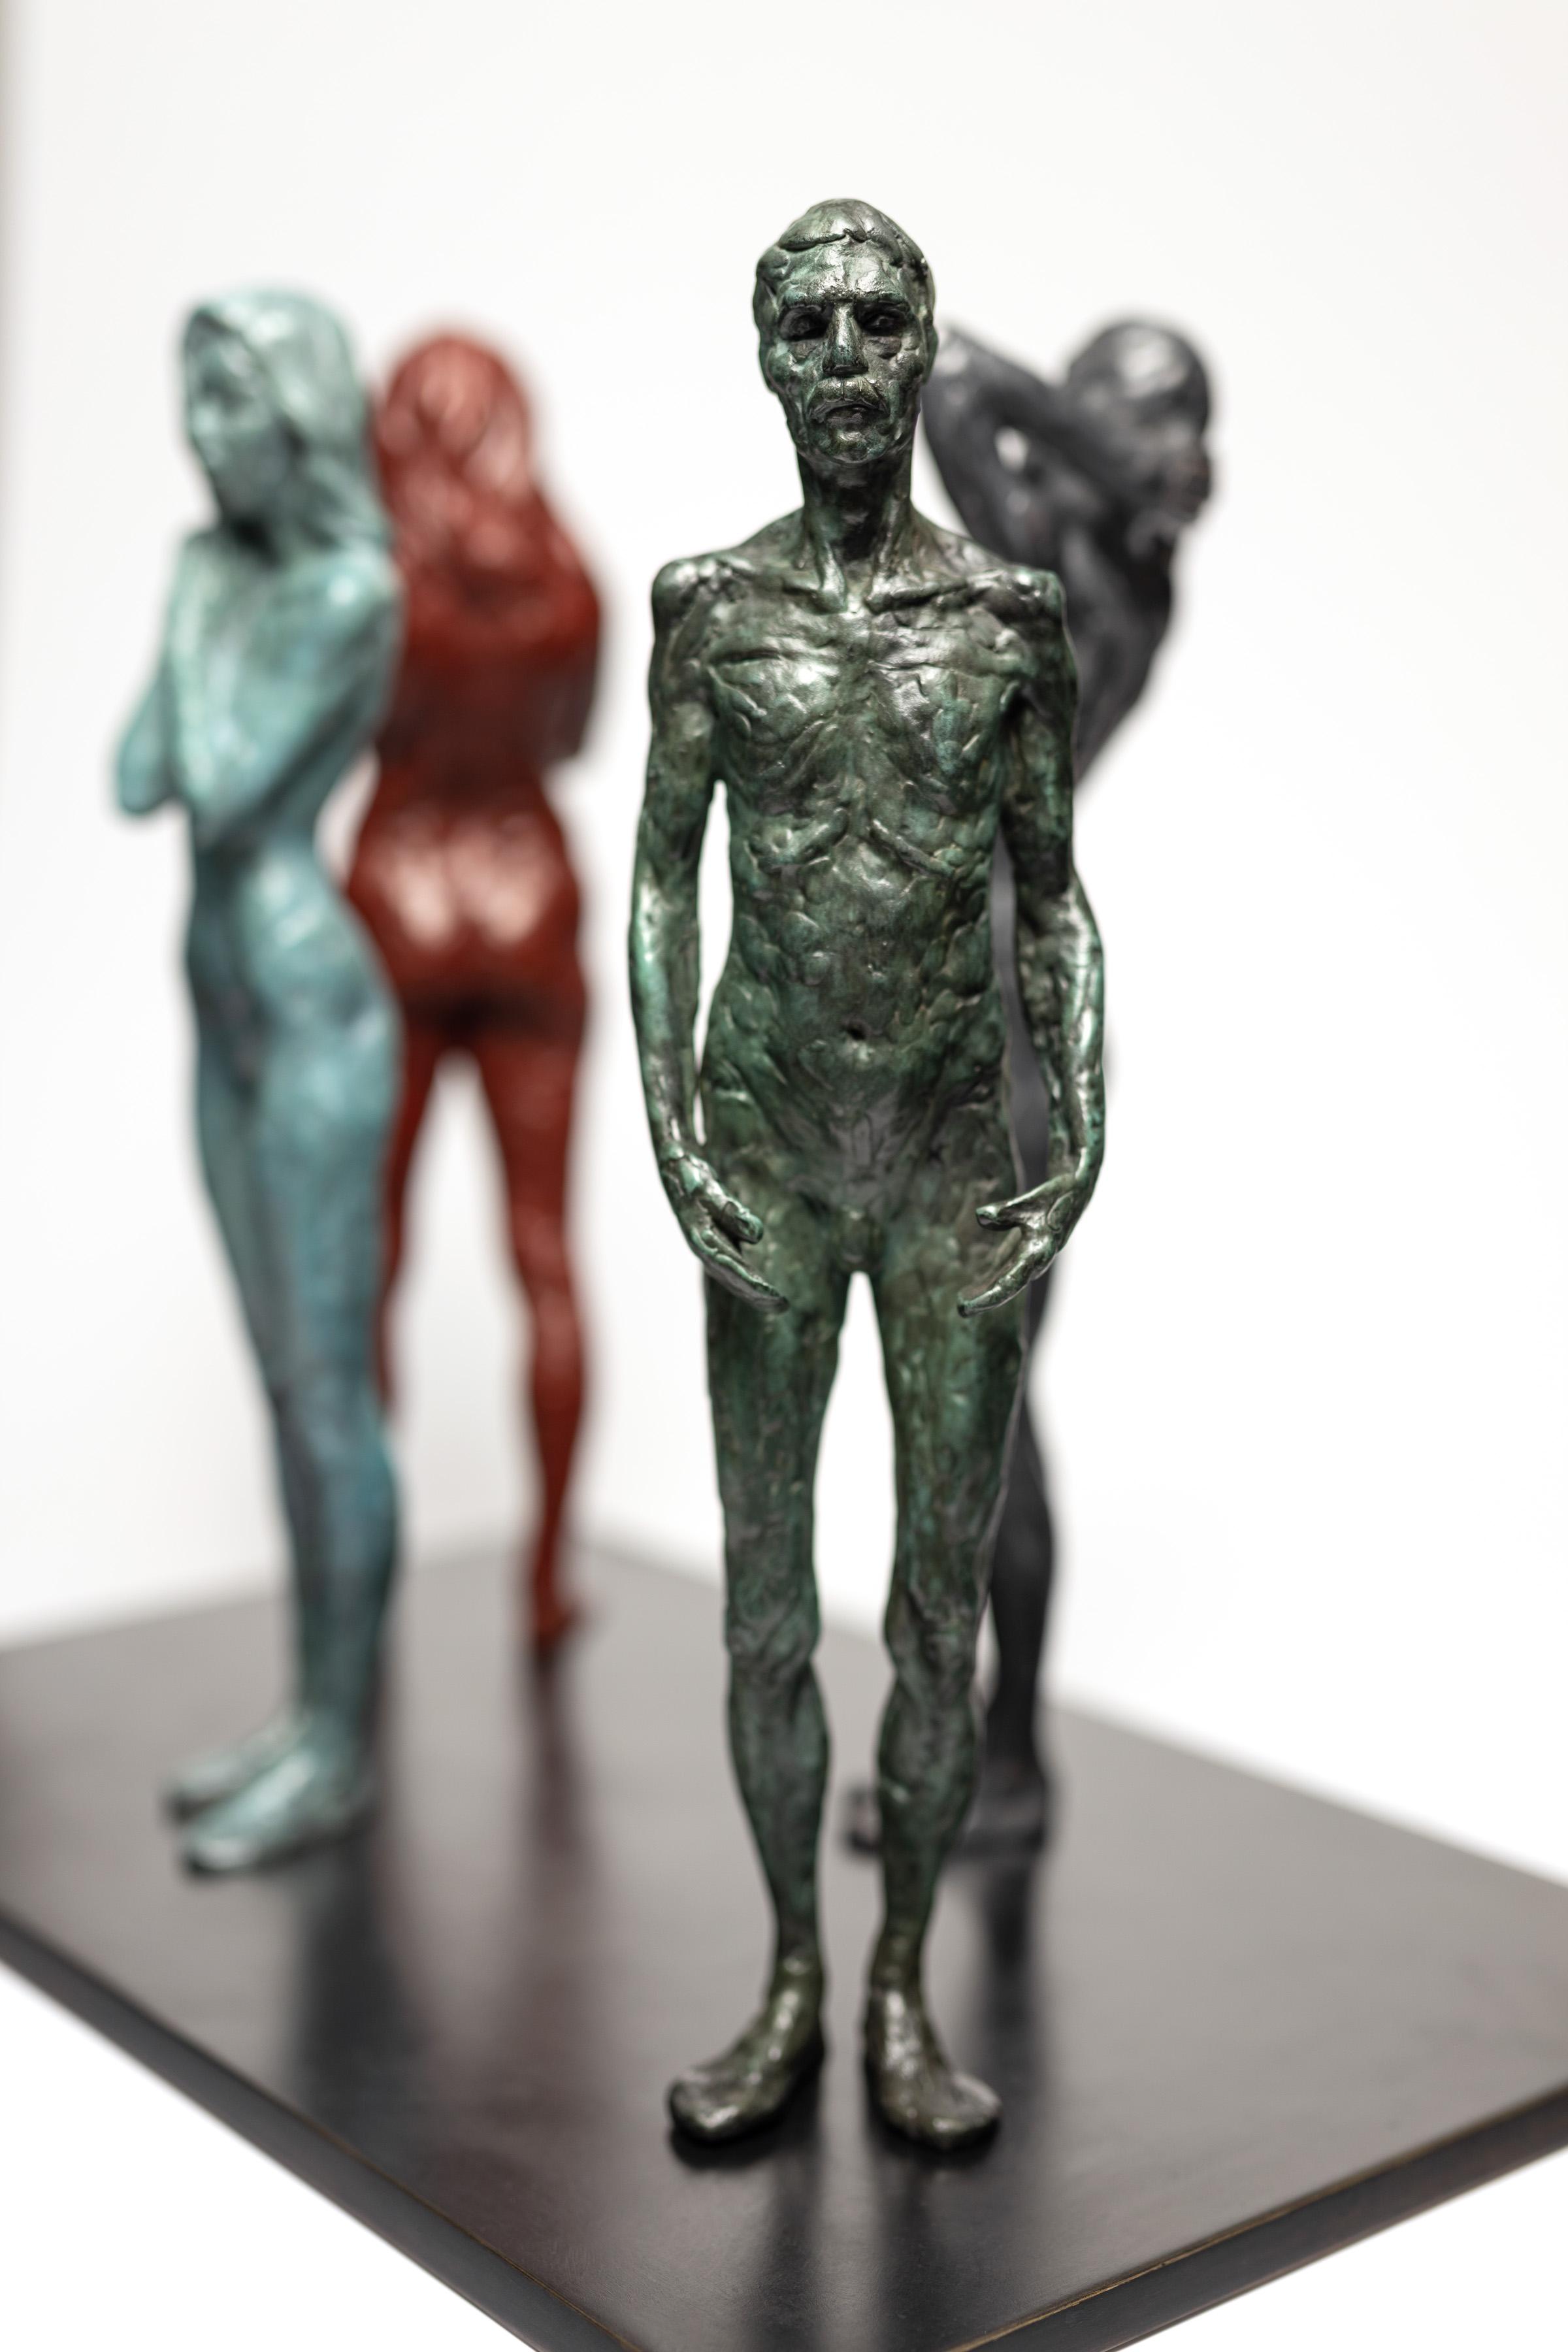 mf-figure-group-bronze-006.jpg